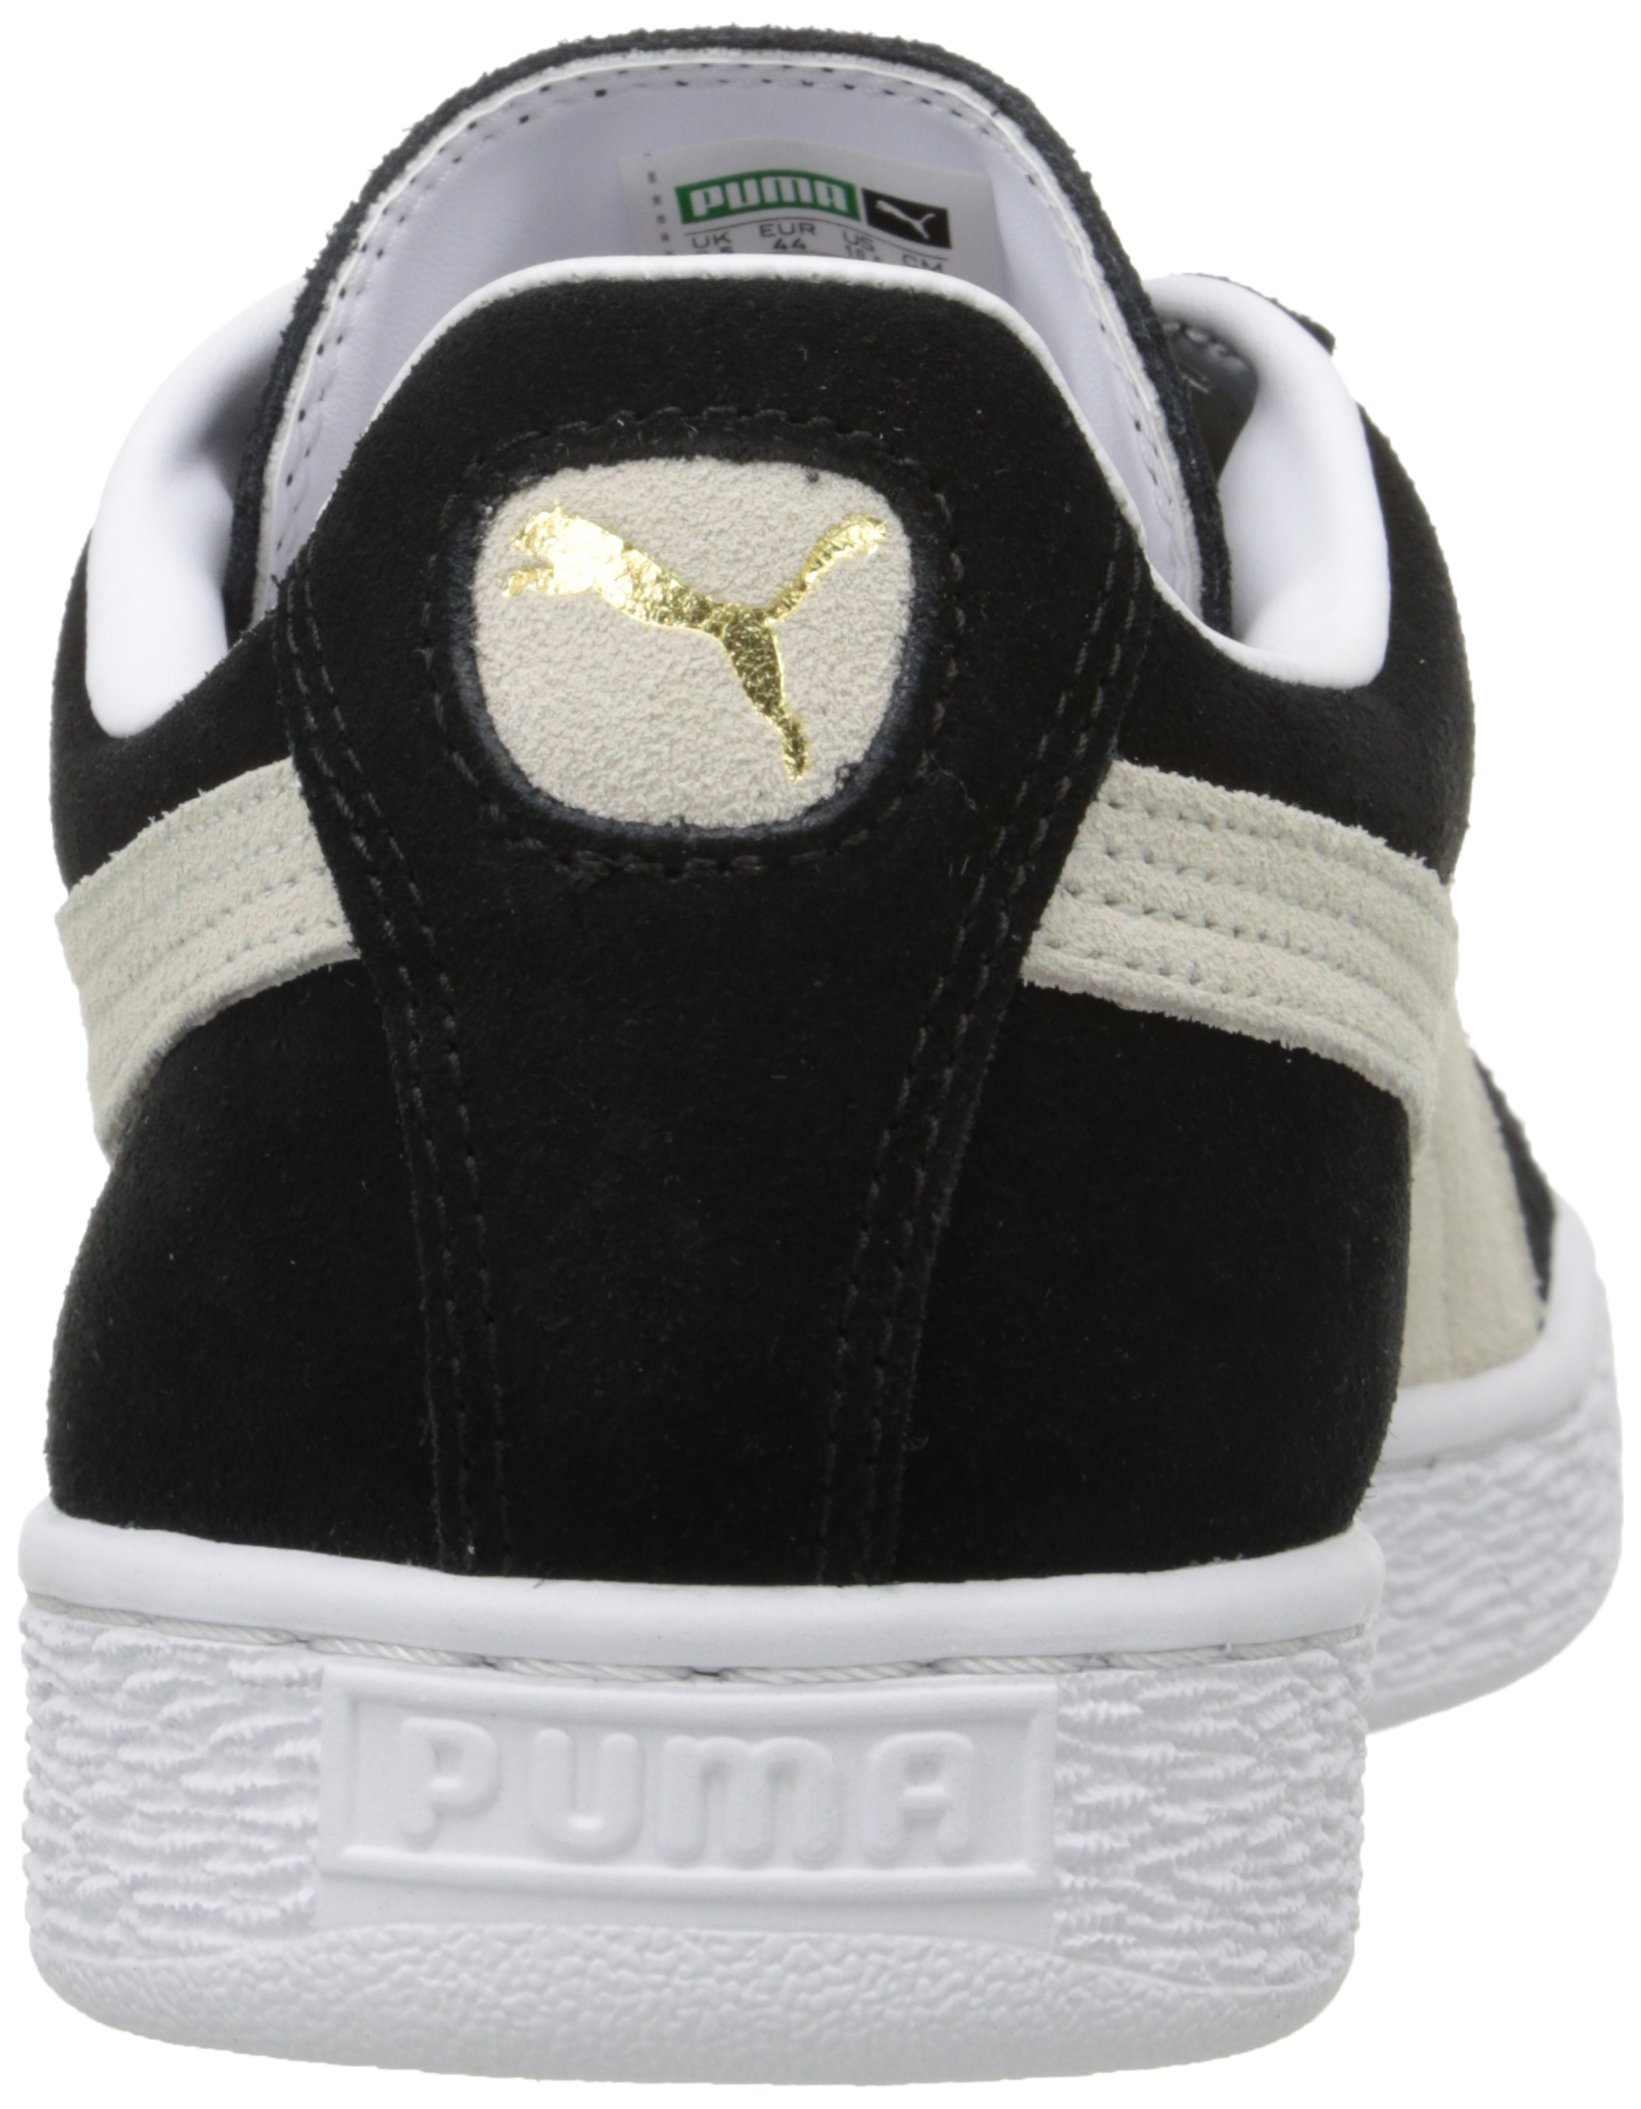 PUMA Suede Classic Sneaker,Black/White,9.5 M US Men's by PUMA (Image #2)